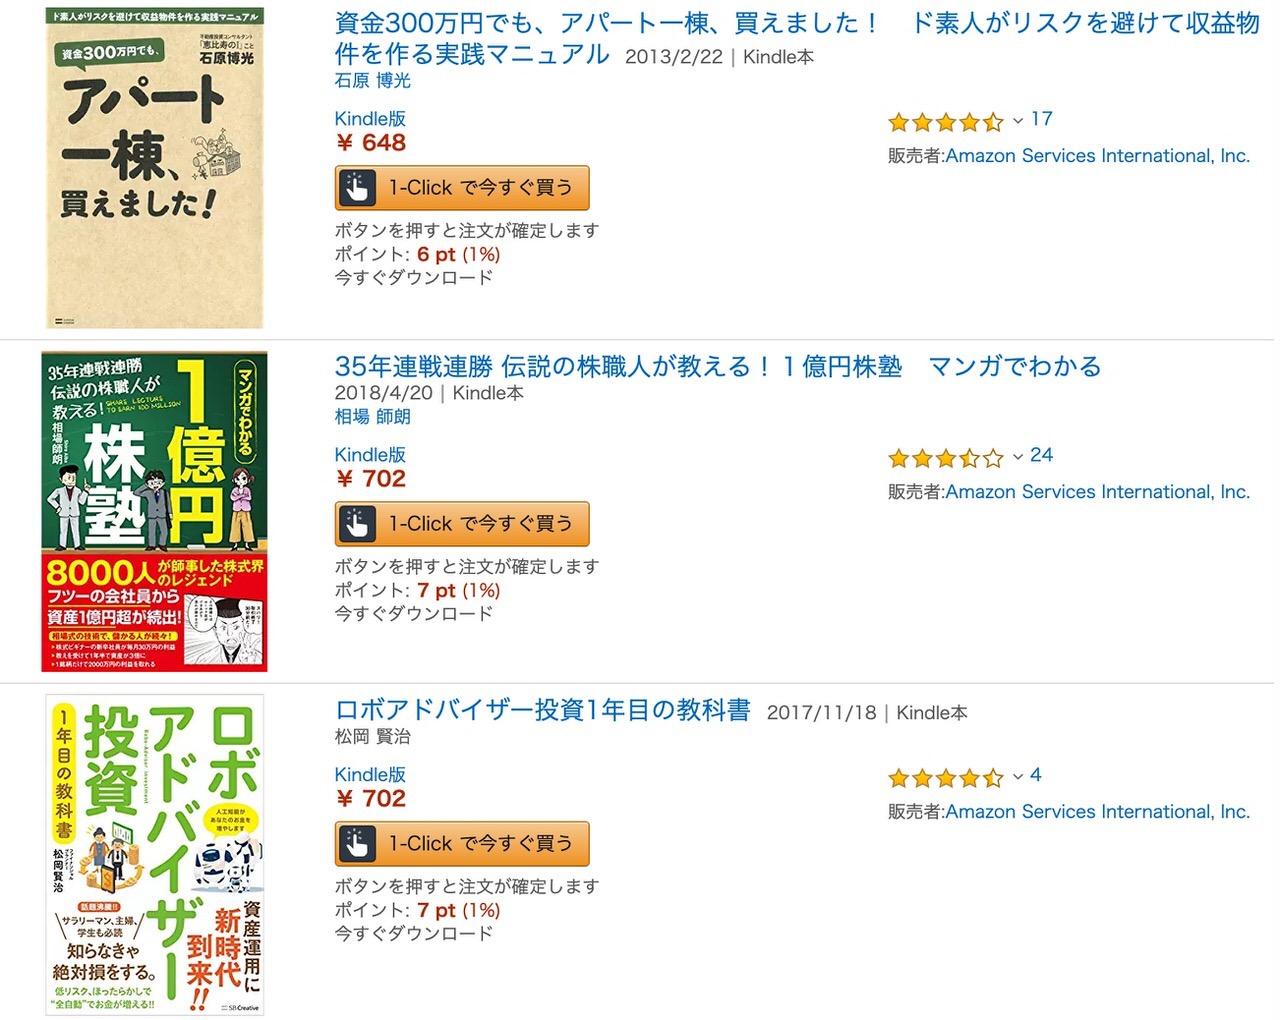 【Kindleセール】よく考えようお金は大事だよ「お金の本フェア」(6/20まで)